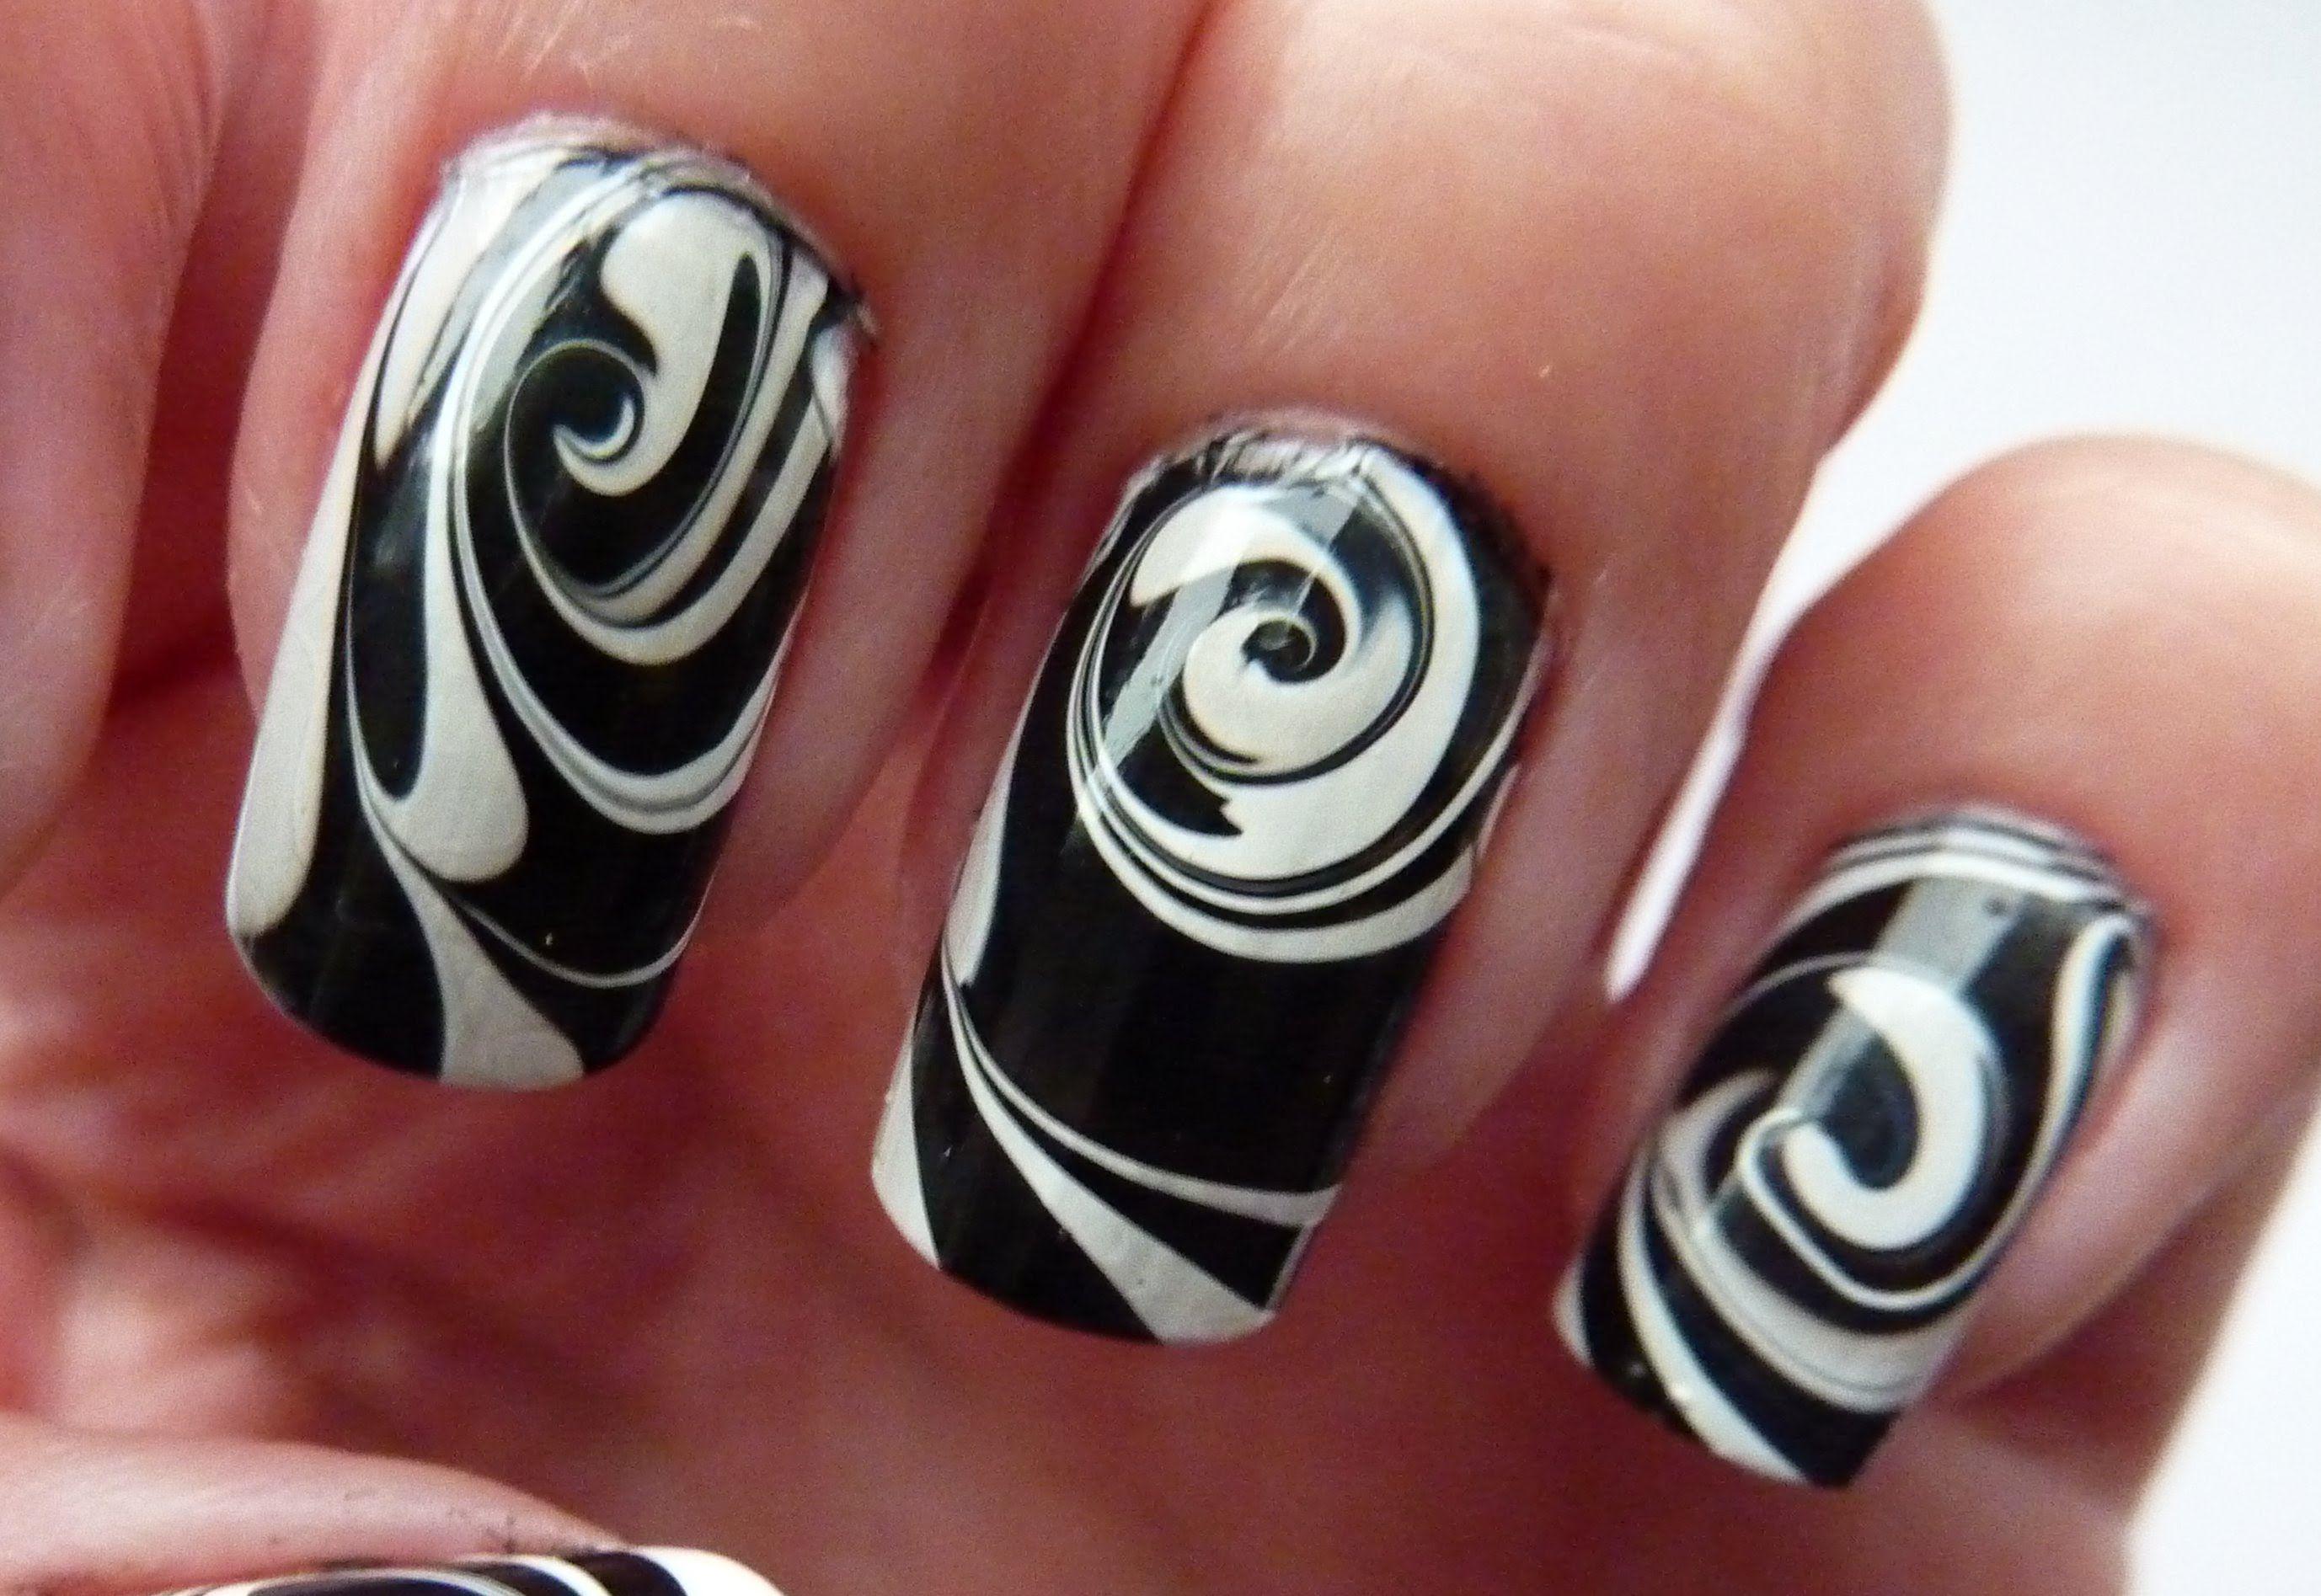 Water Marble For Short Nails, Black & White Swirl Nail Art Design ...